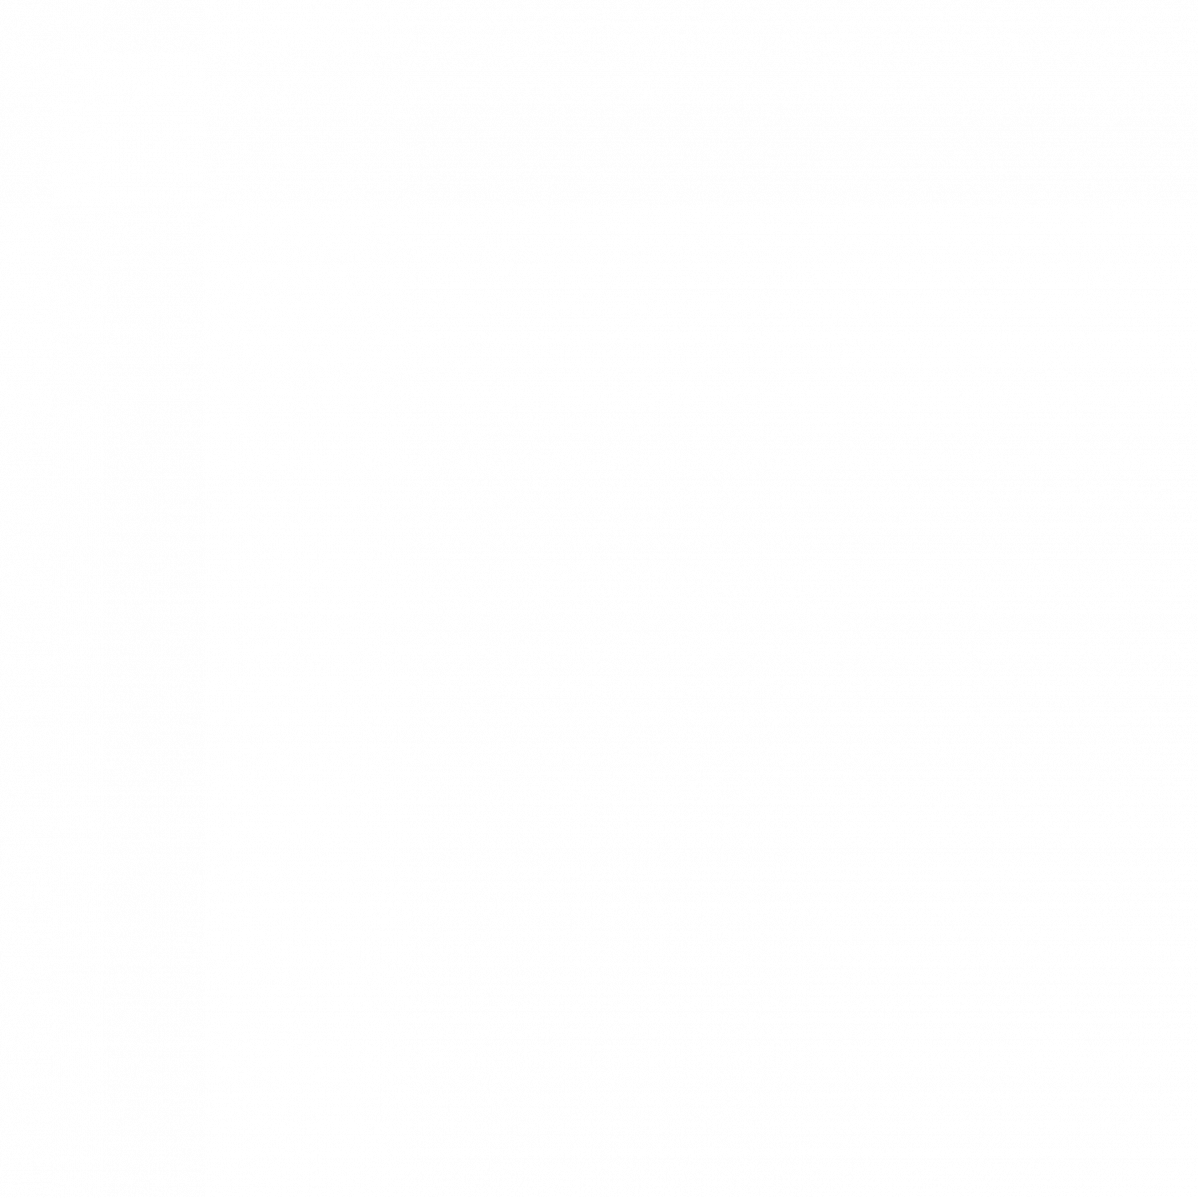 Elle Est Forte (West Africa) Sticker